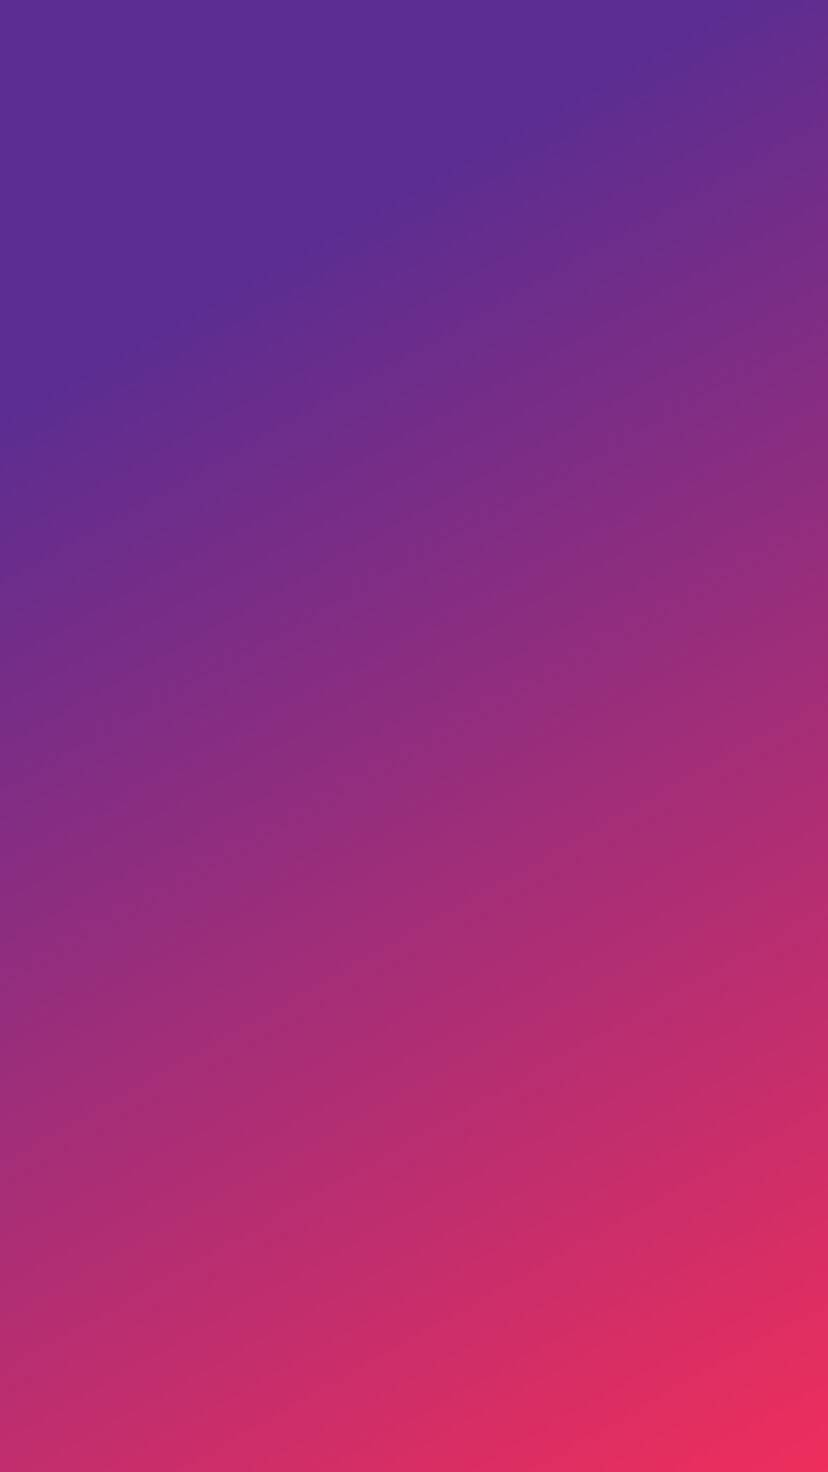 00-bg-gradient-mobile...